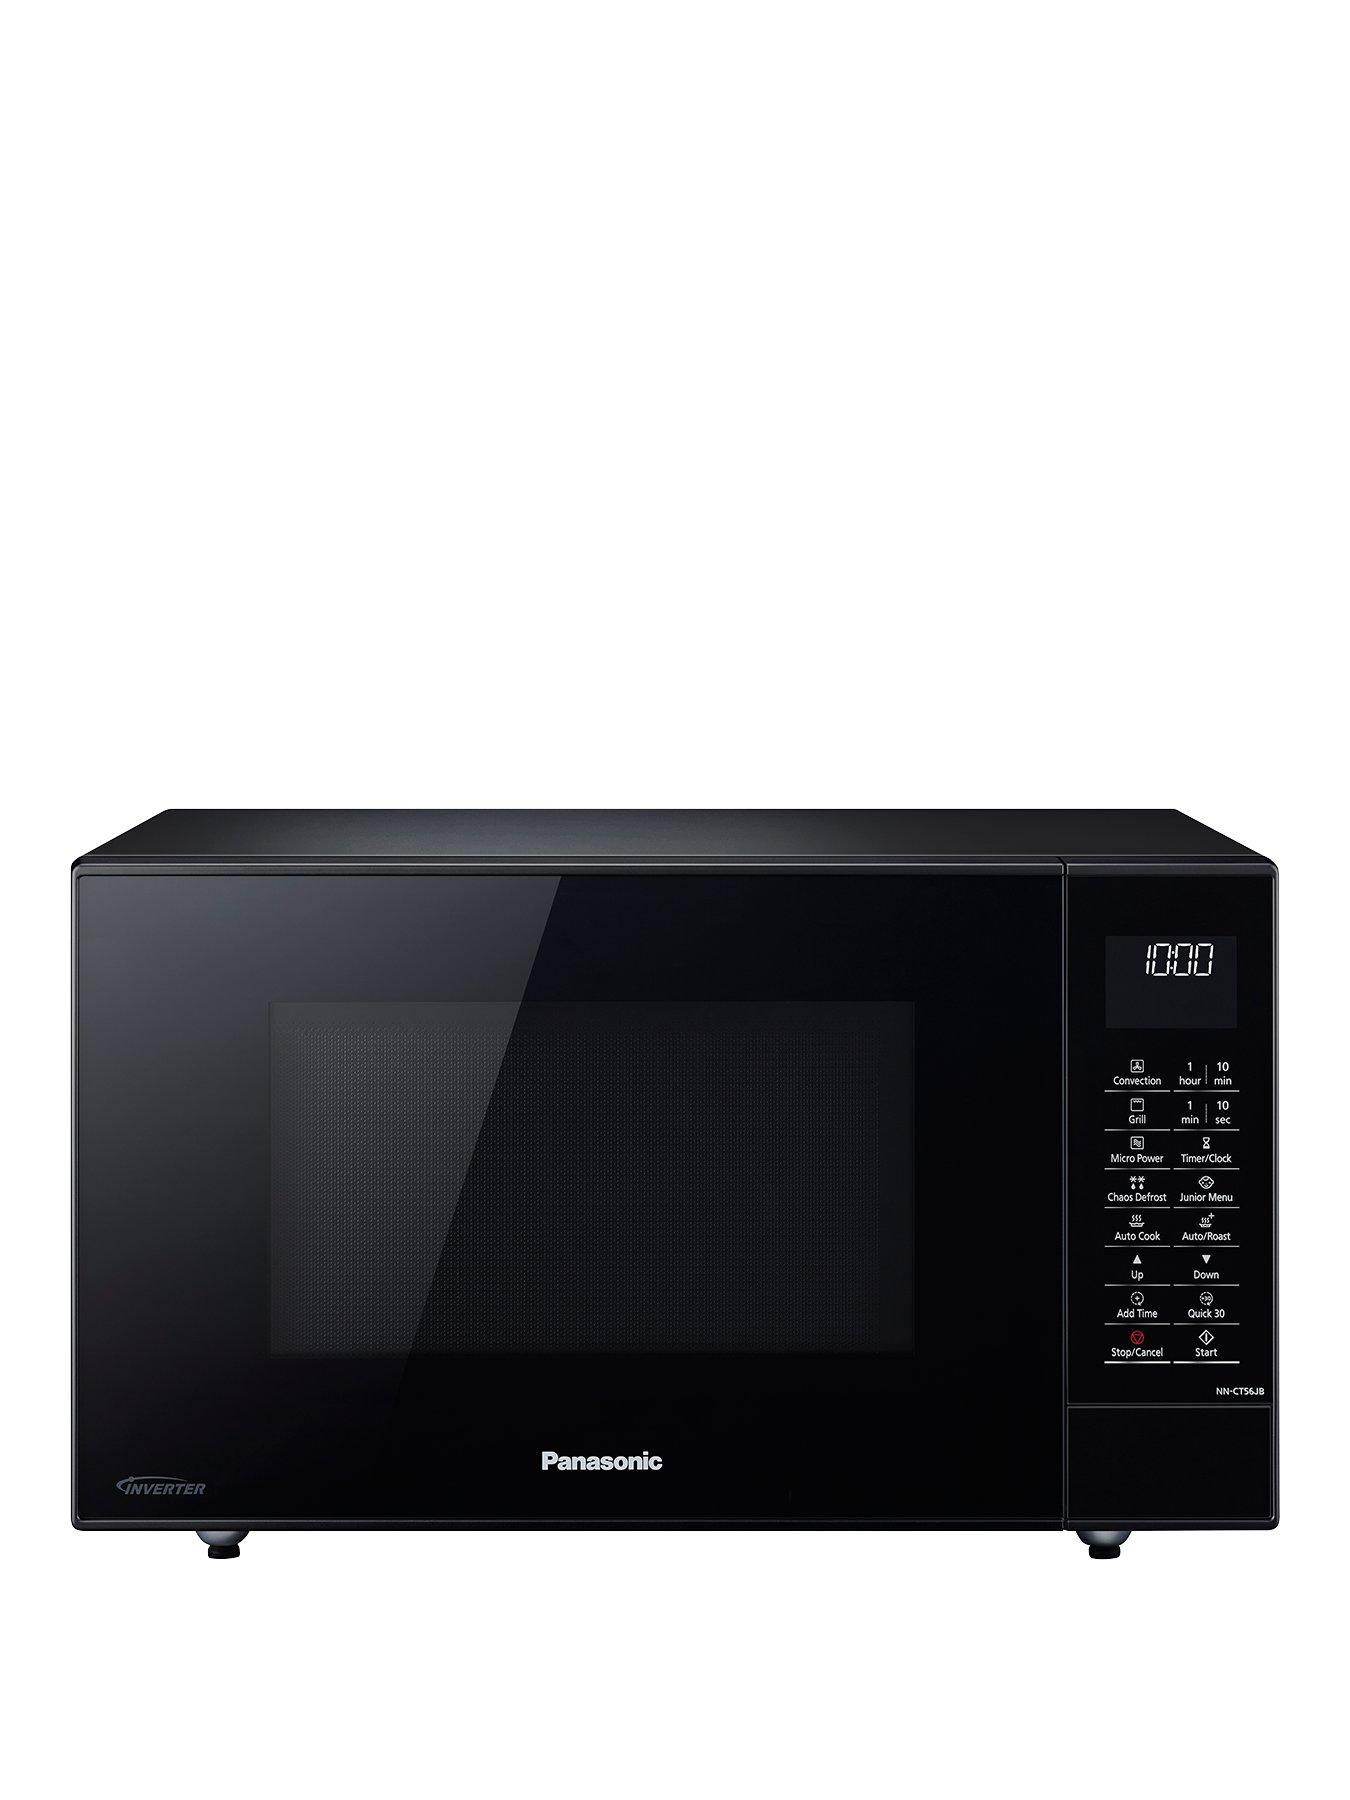 27 litre slimline microwave oven grill with inverter technology nn ct56jbbpq